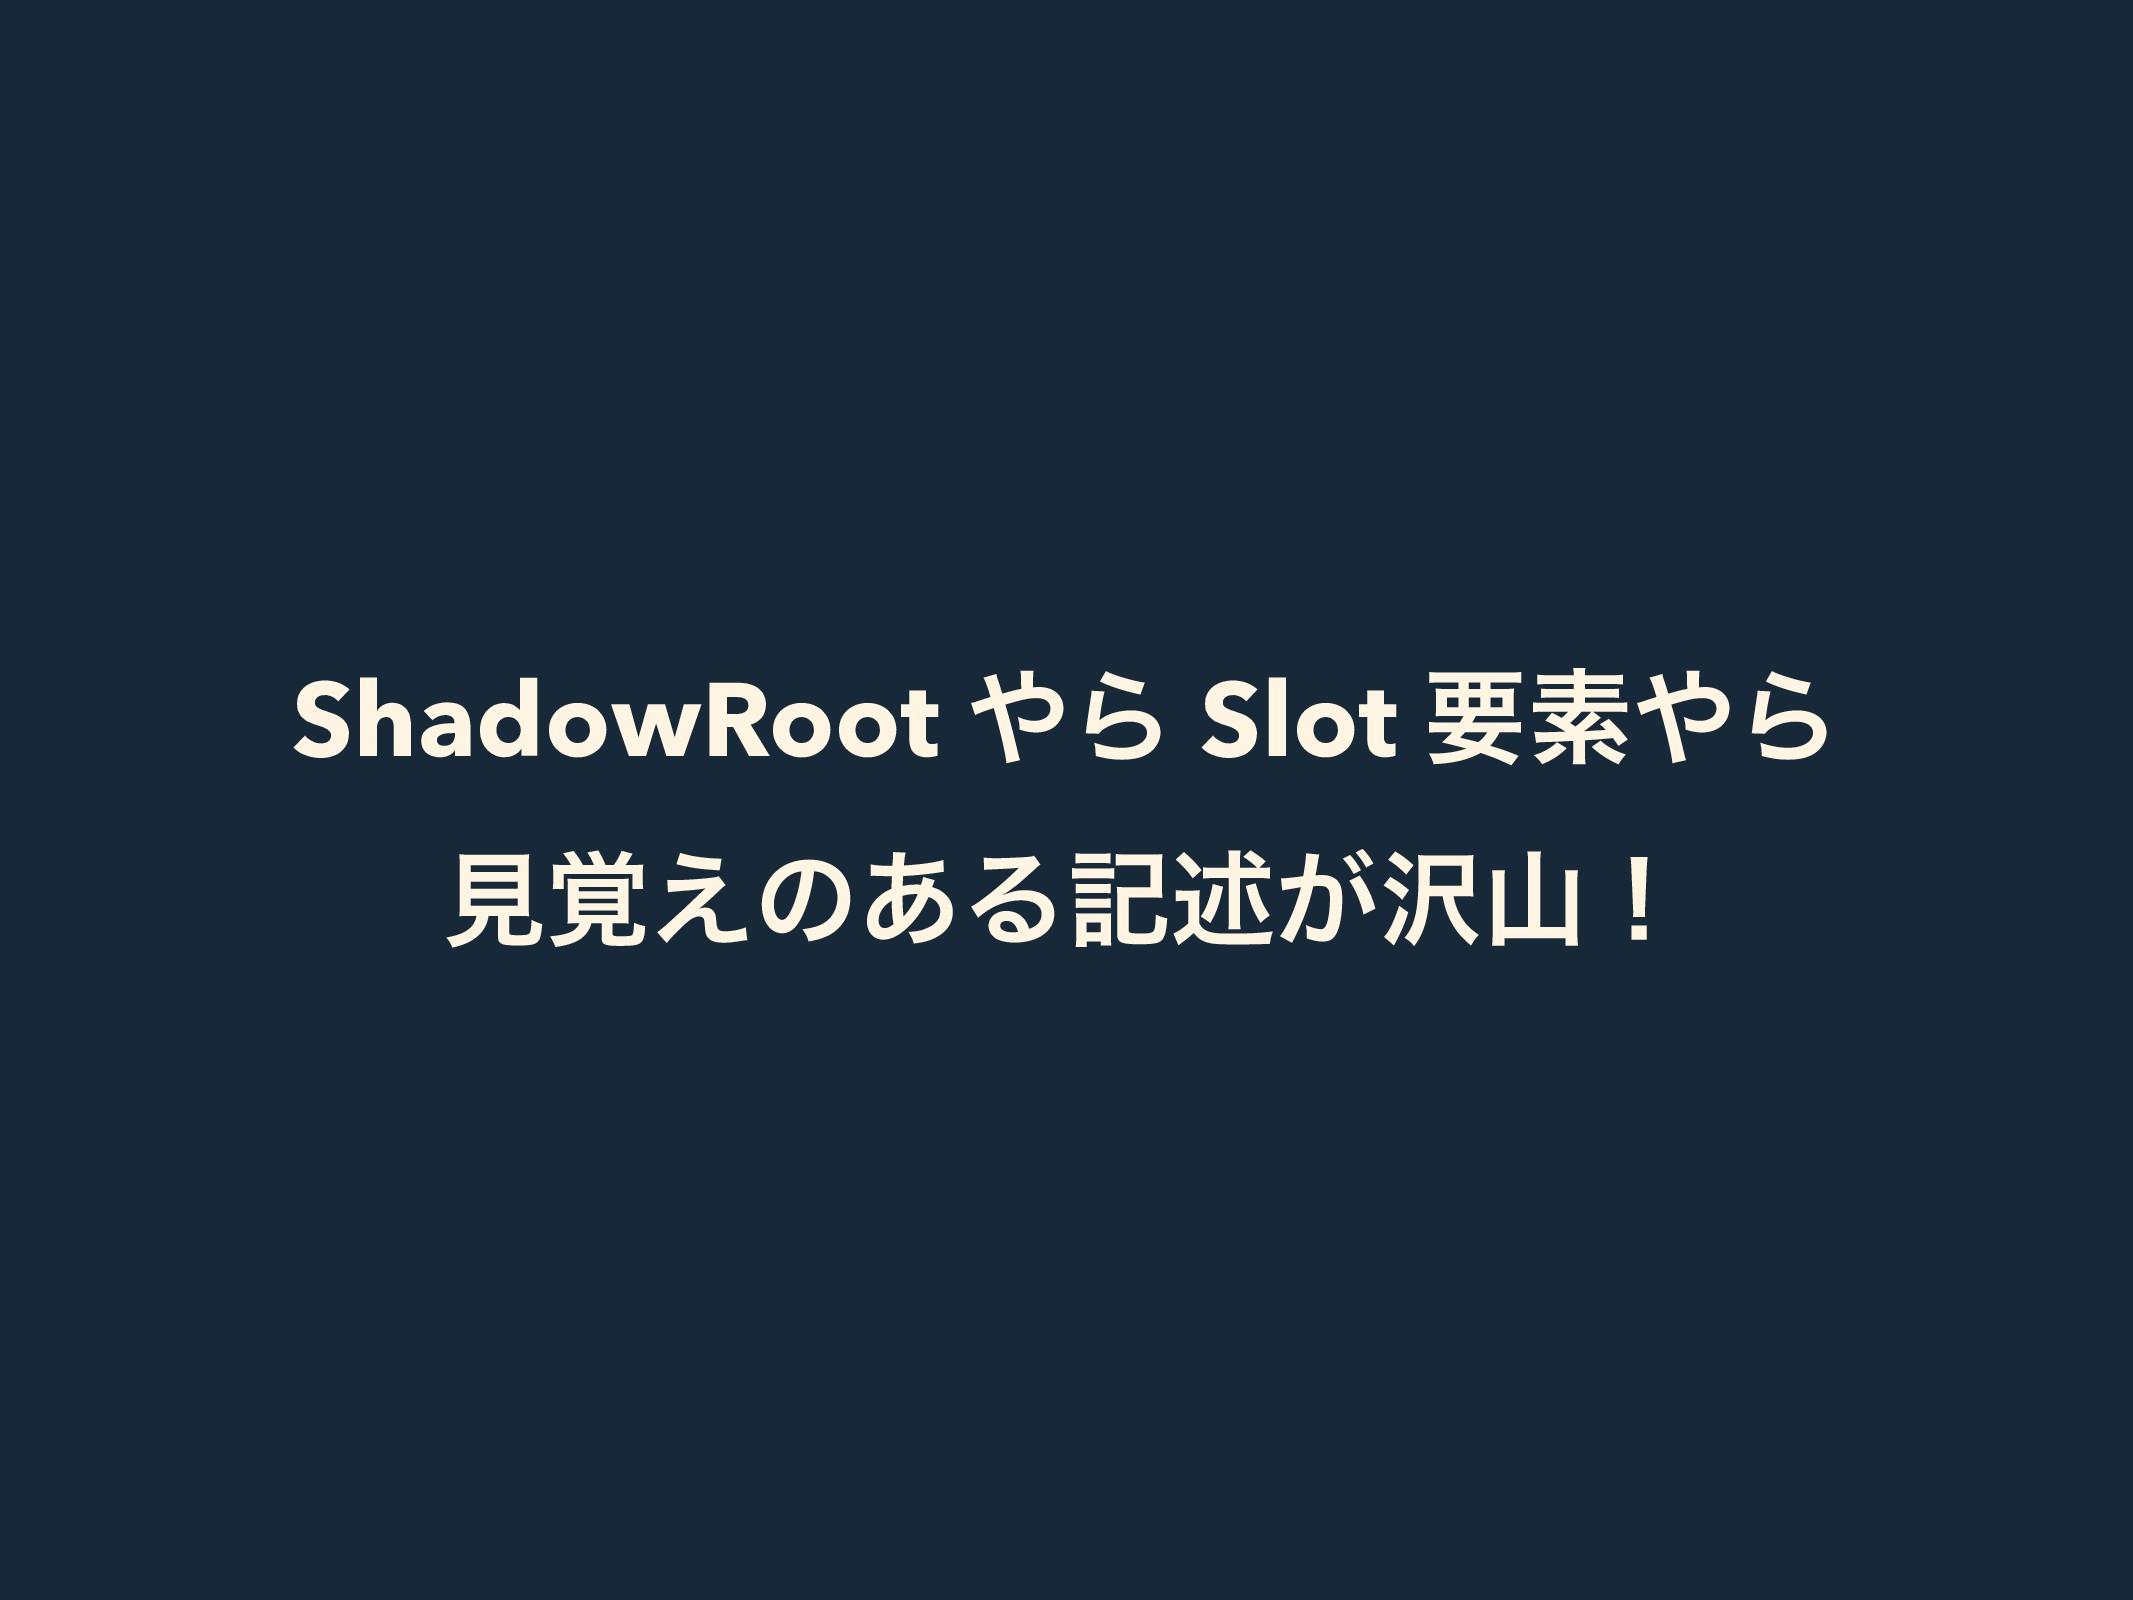 ShadowRoot Β Slot ཁૉΒ ݟ֮͑ͷ͋Δهड़͕ʂ